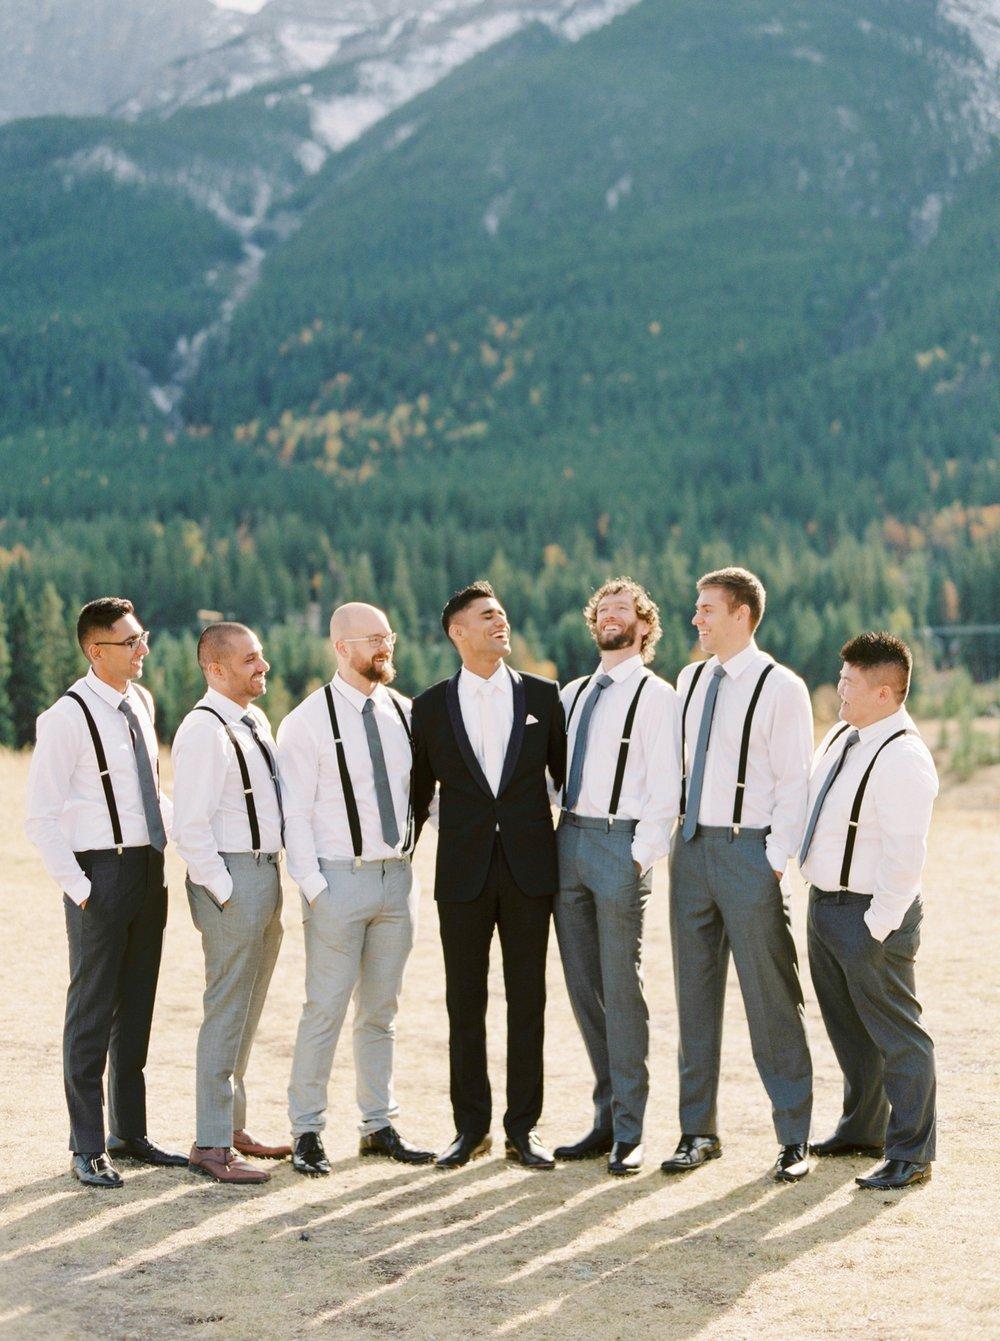 Calgary wedding photographers | fine art film | Justine Milton Photography | canmore wedding photographers | groomsmen portraits | mountain wedding